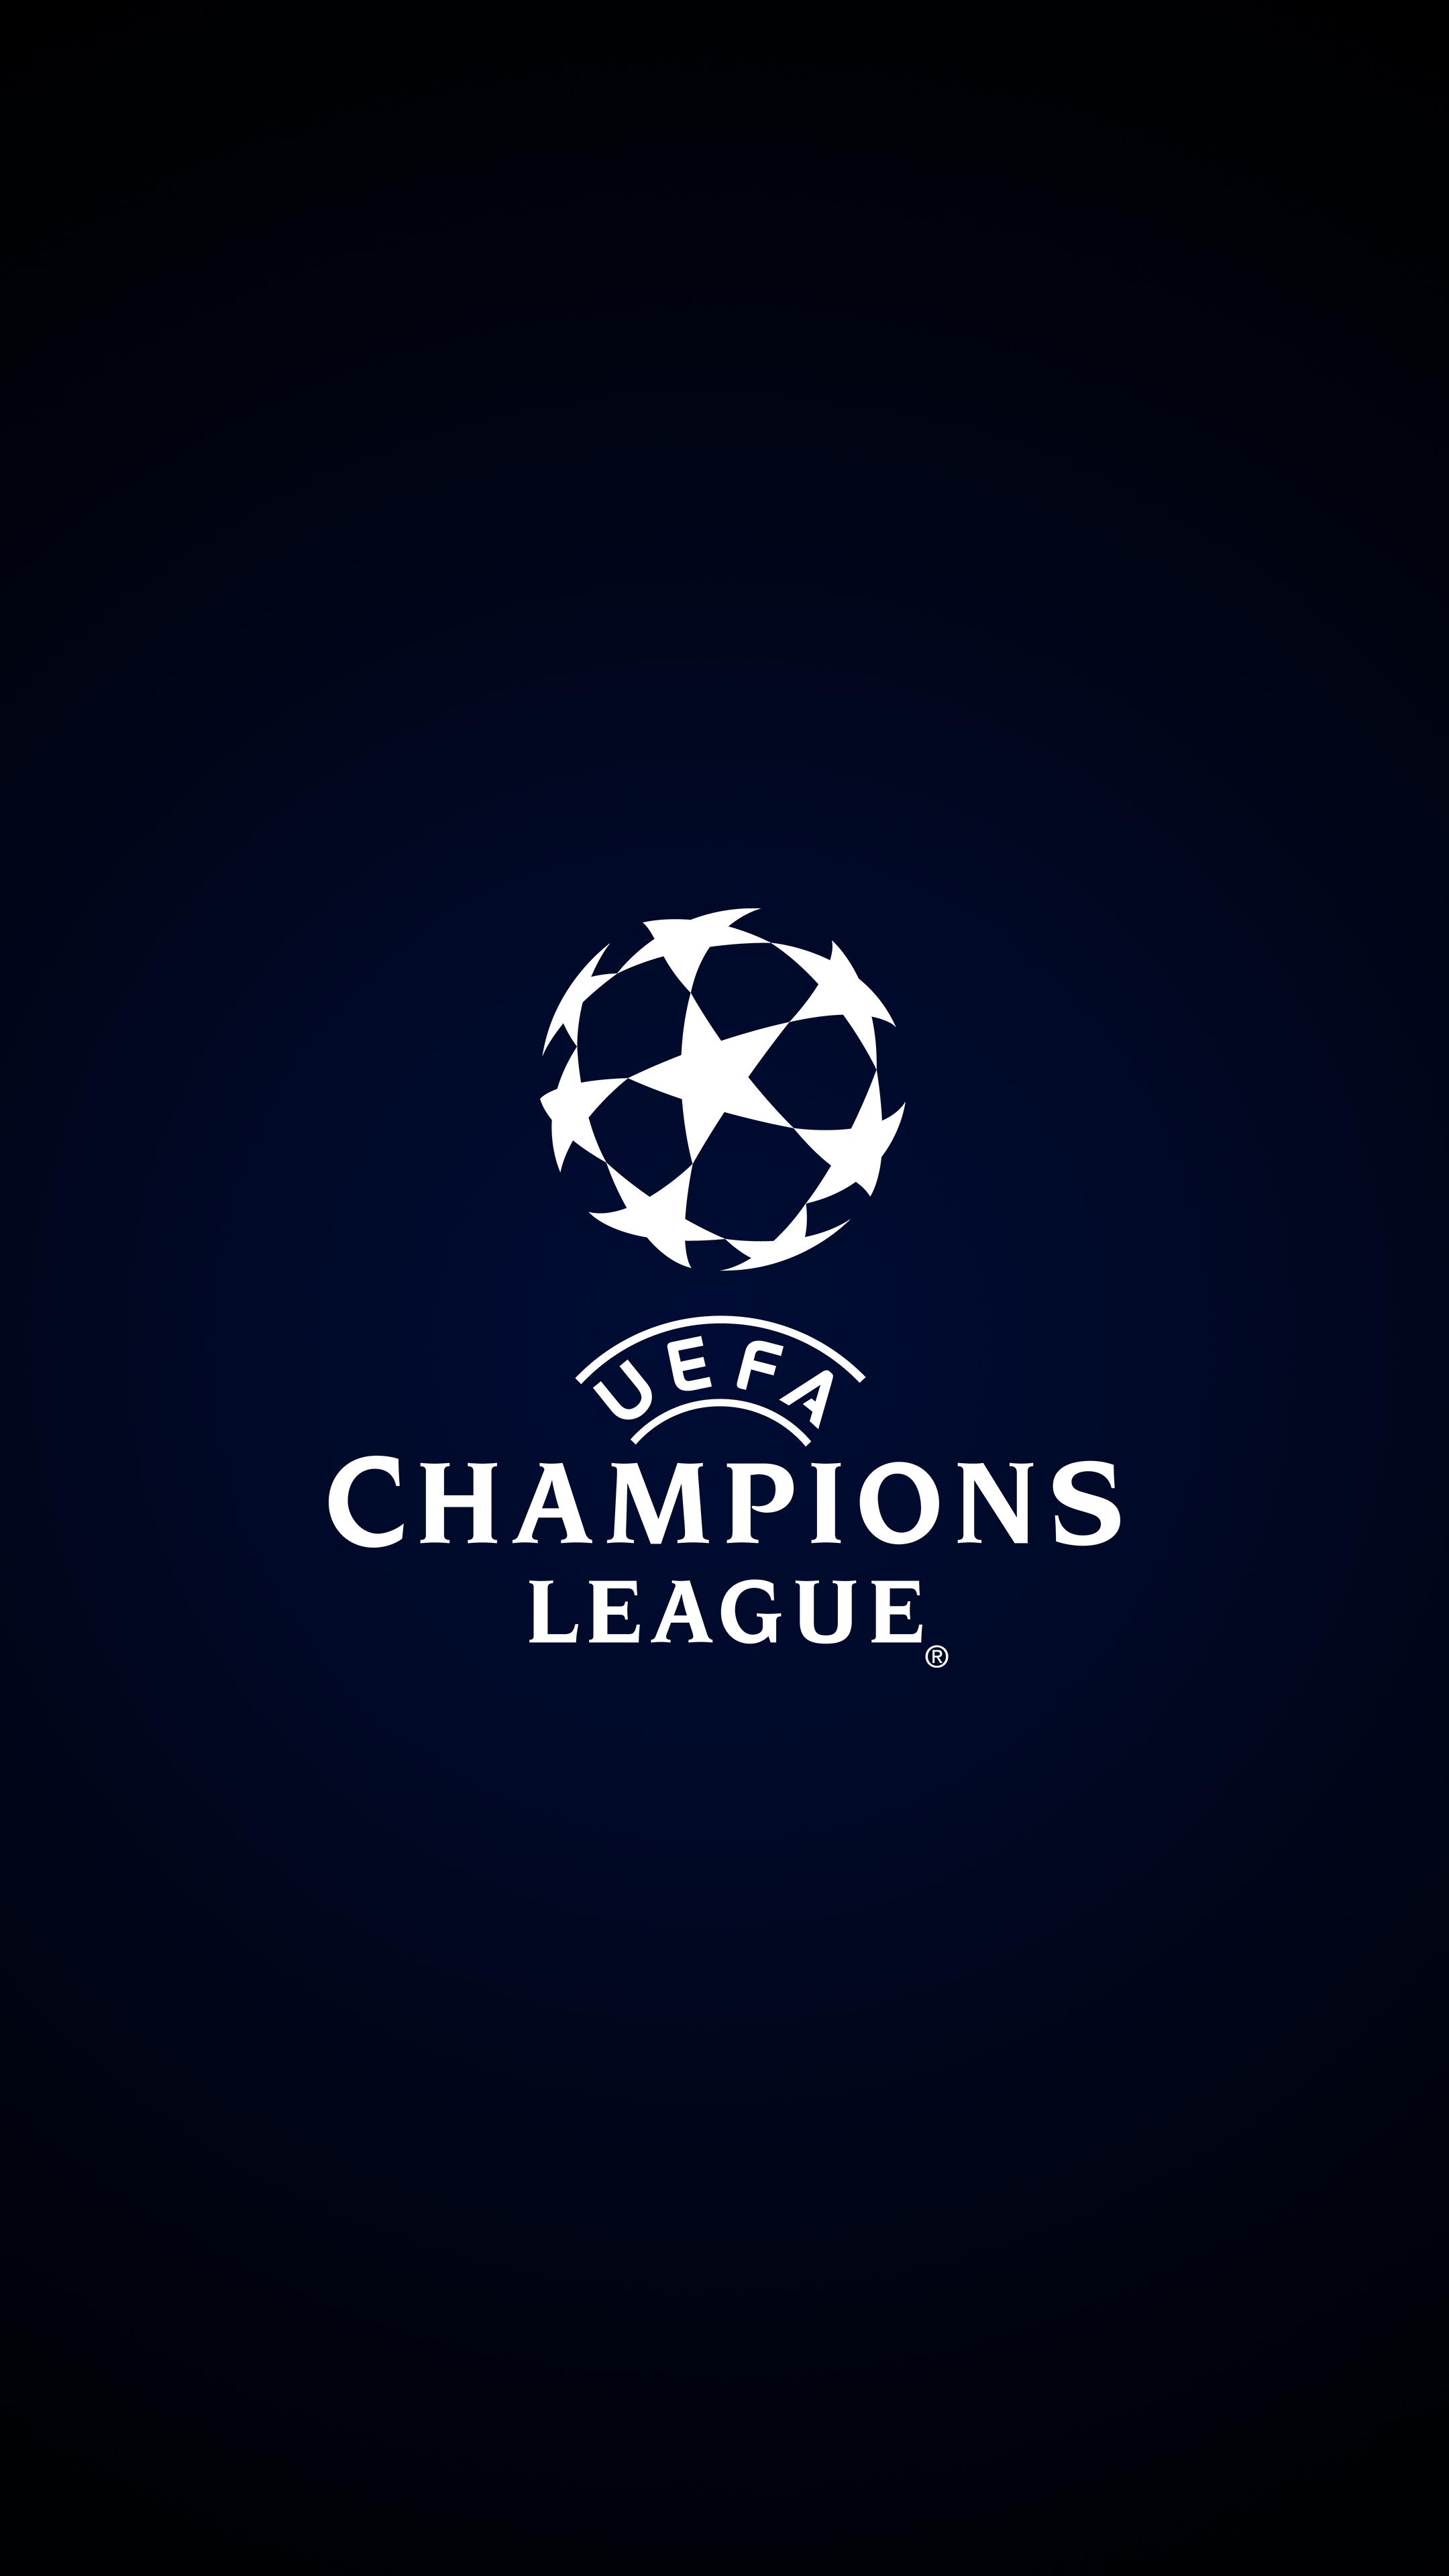 Uefa Champions League 4k Magnificent Wallpaper Barcelona Dibujo Fútbol Fondo De Pantalla De La Ciudad